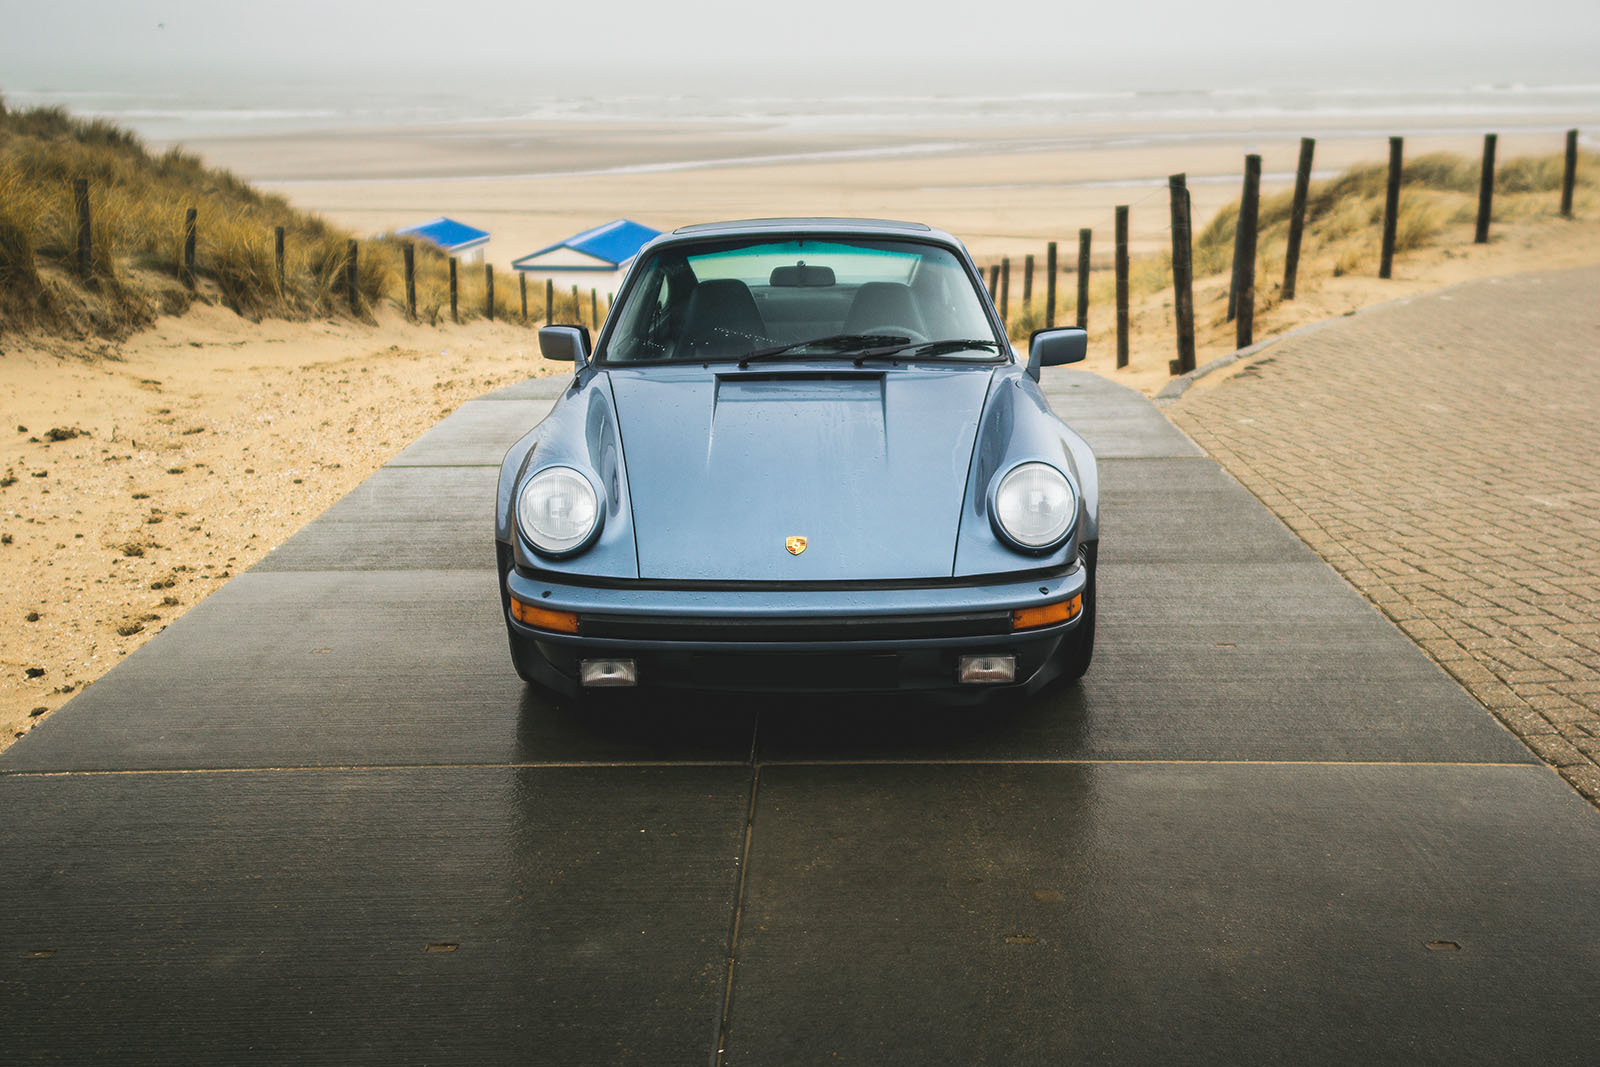 Porsche 911 Turbo 3.3 (1983) For Sale (picture 2 of 6)